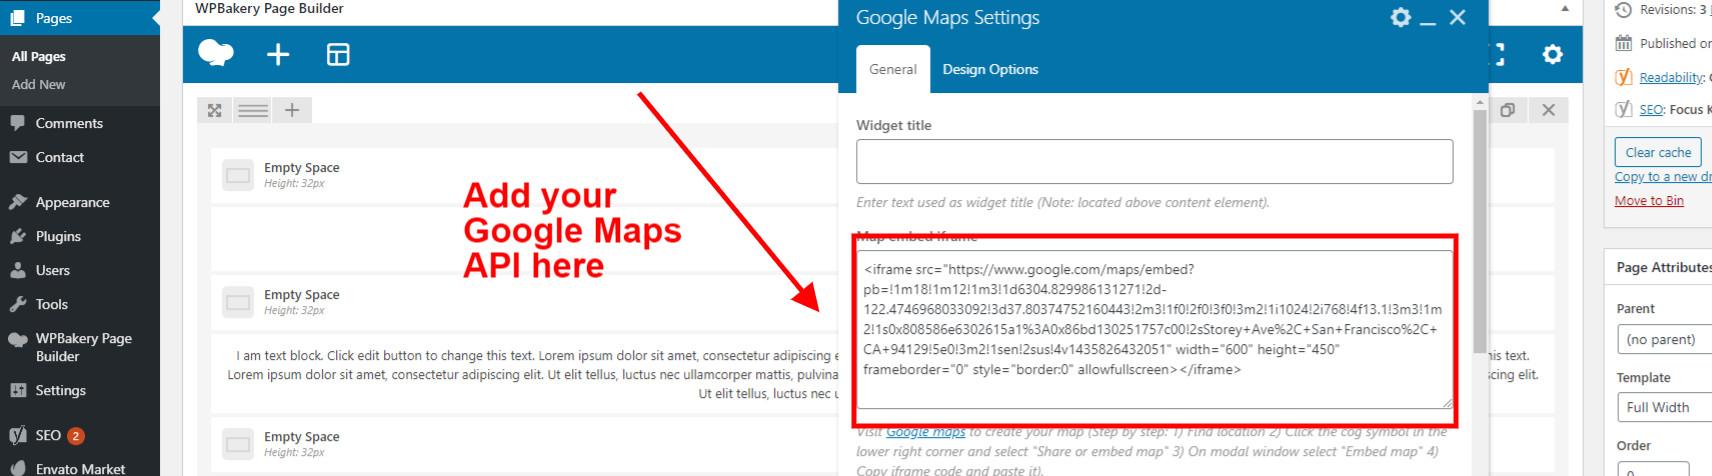 Add API for Google Maps